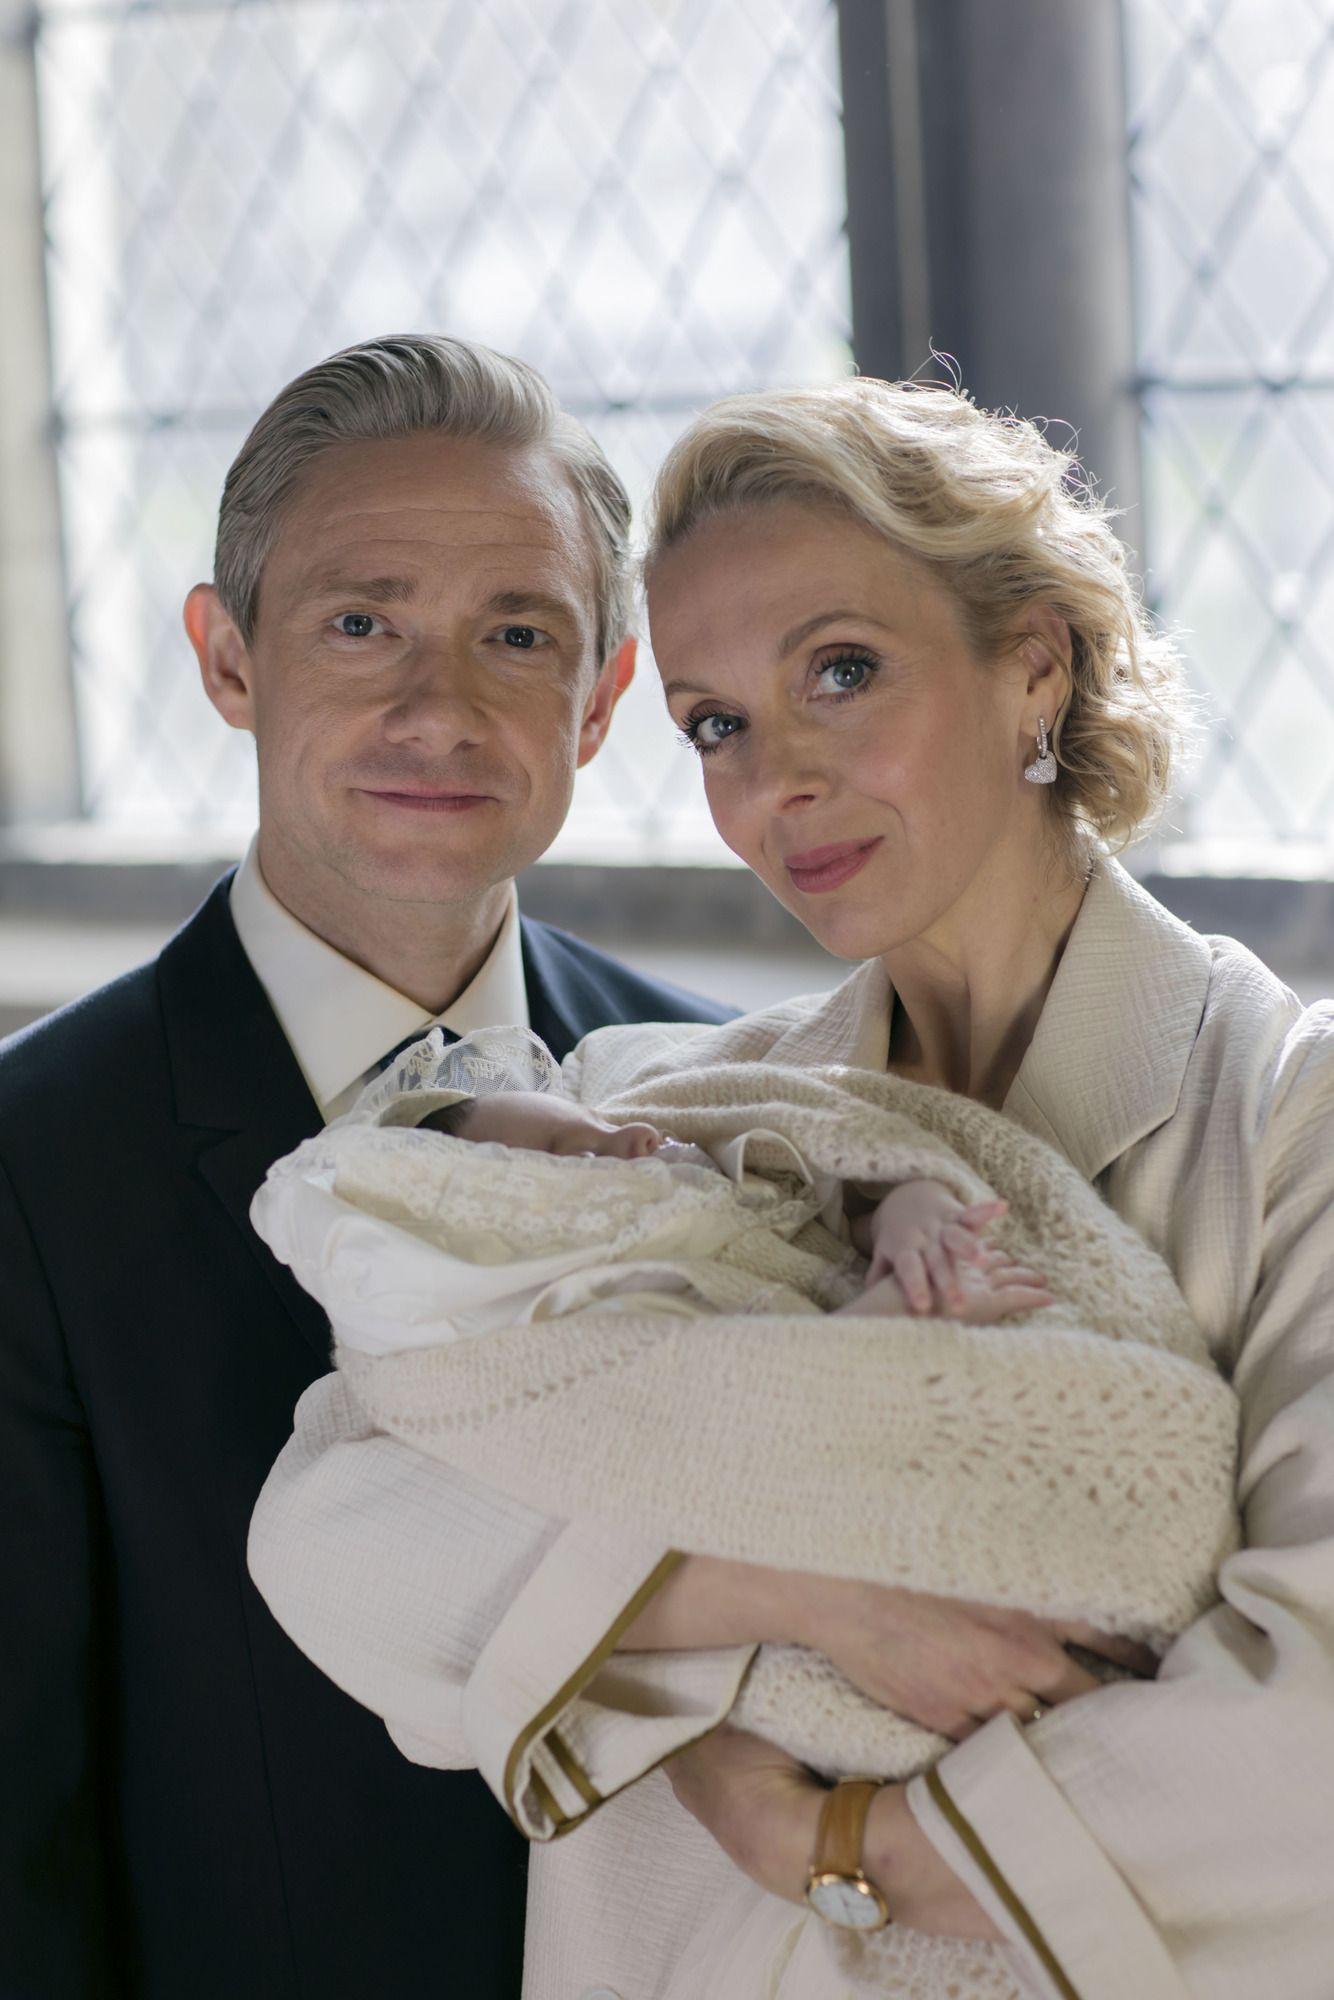 Sherlock's Amanda Abbington opens up about her split from Martin Freeman